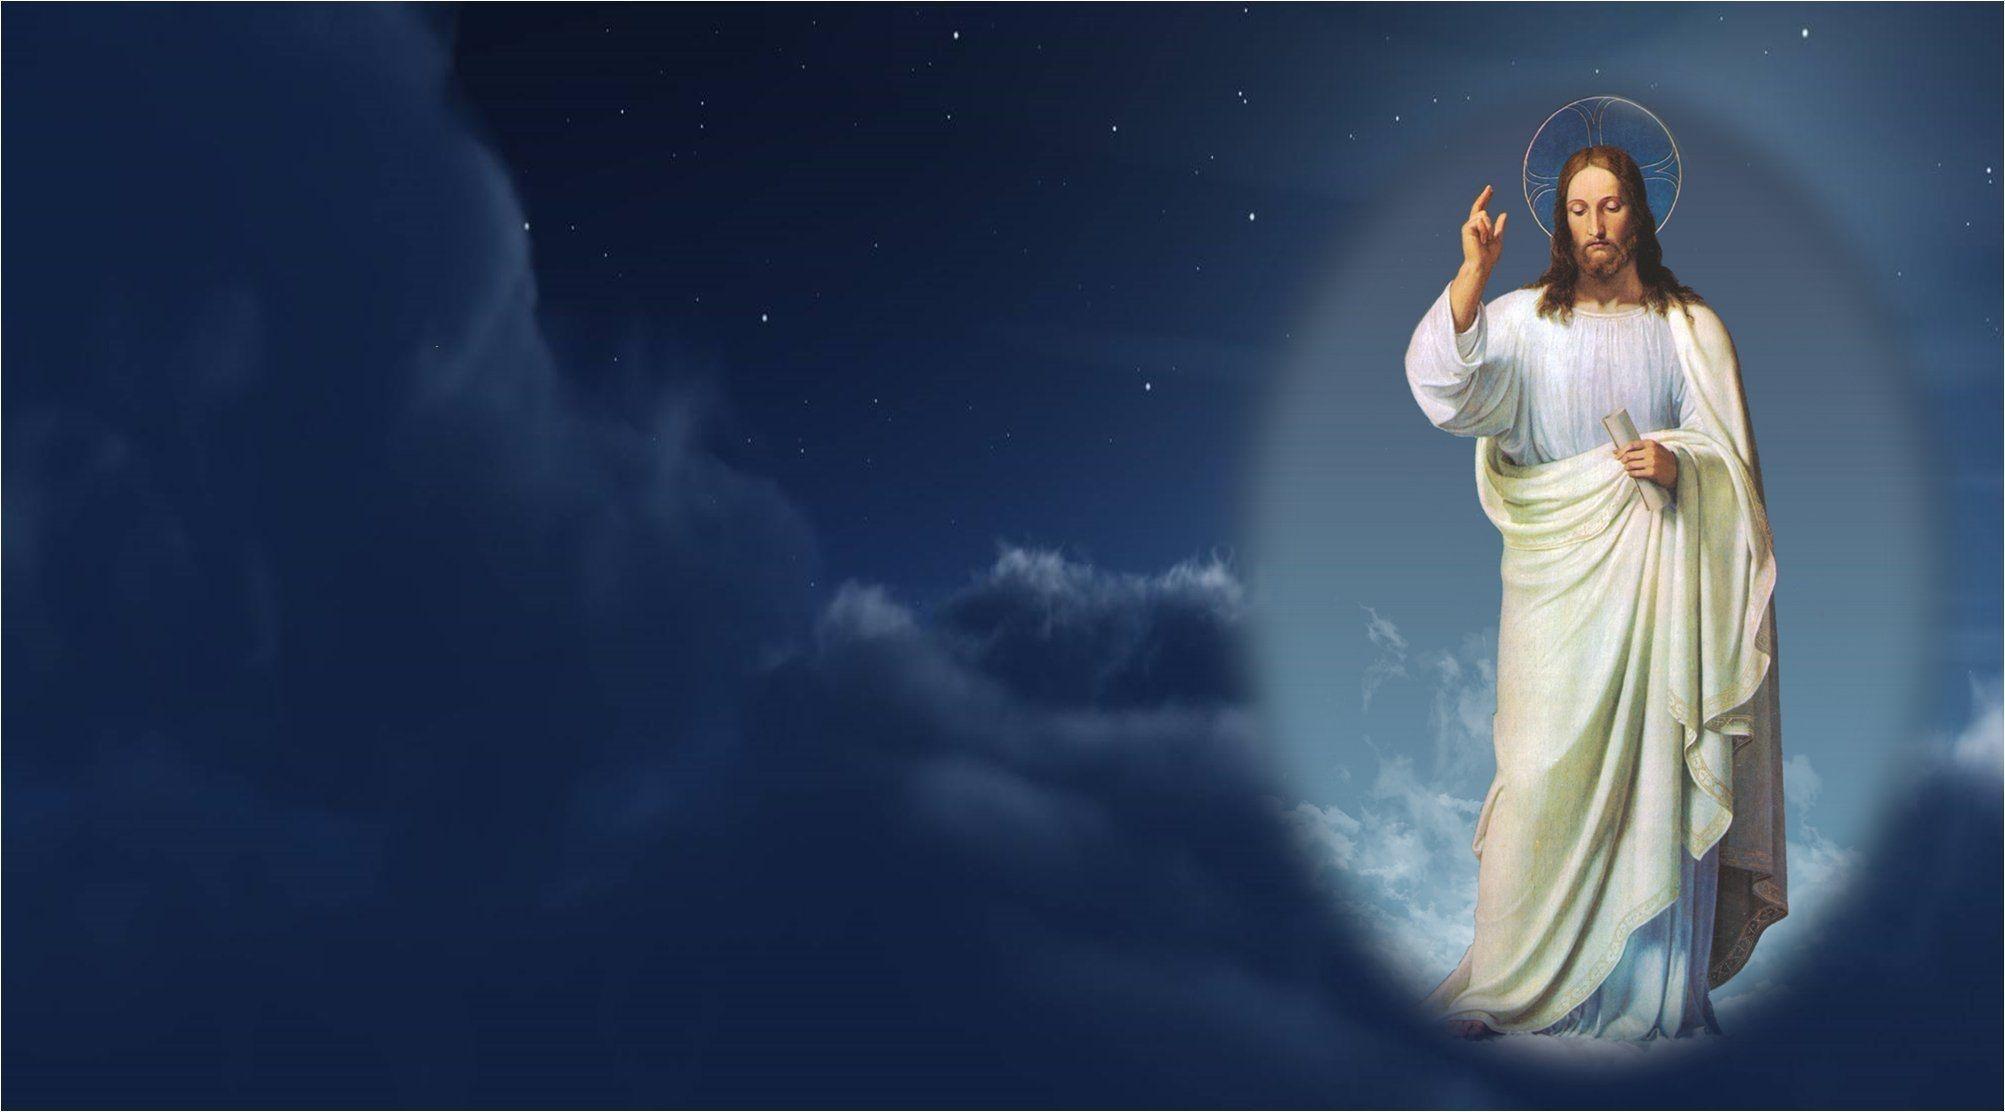 8054 jesus christ wallpaper backgrounds pictures | 2005 x 1112